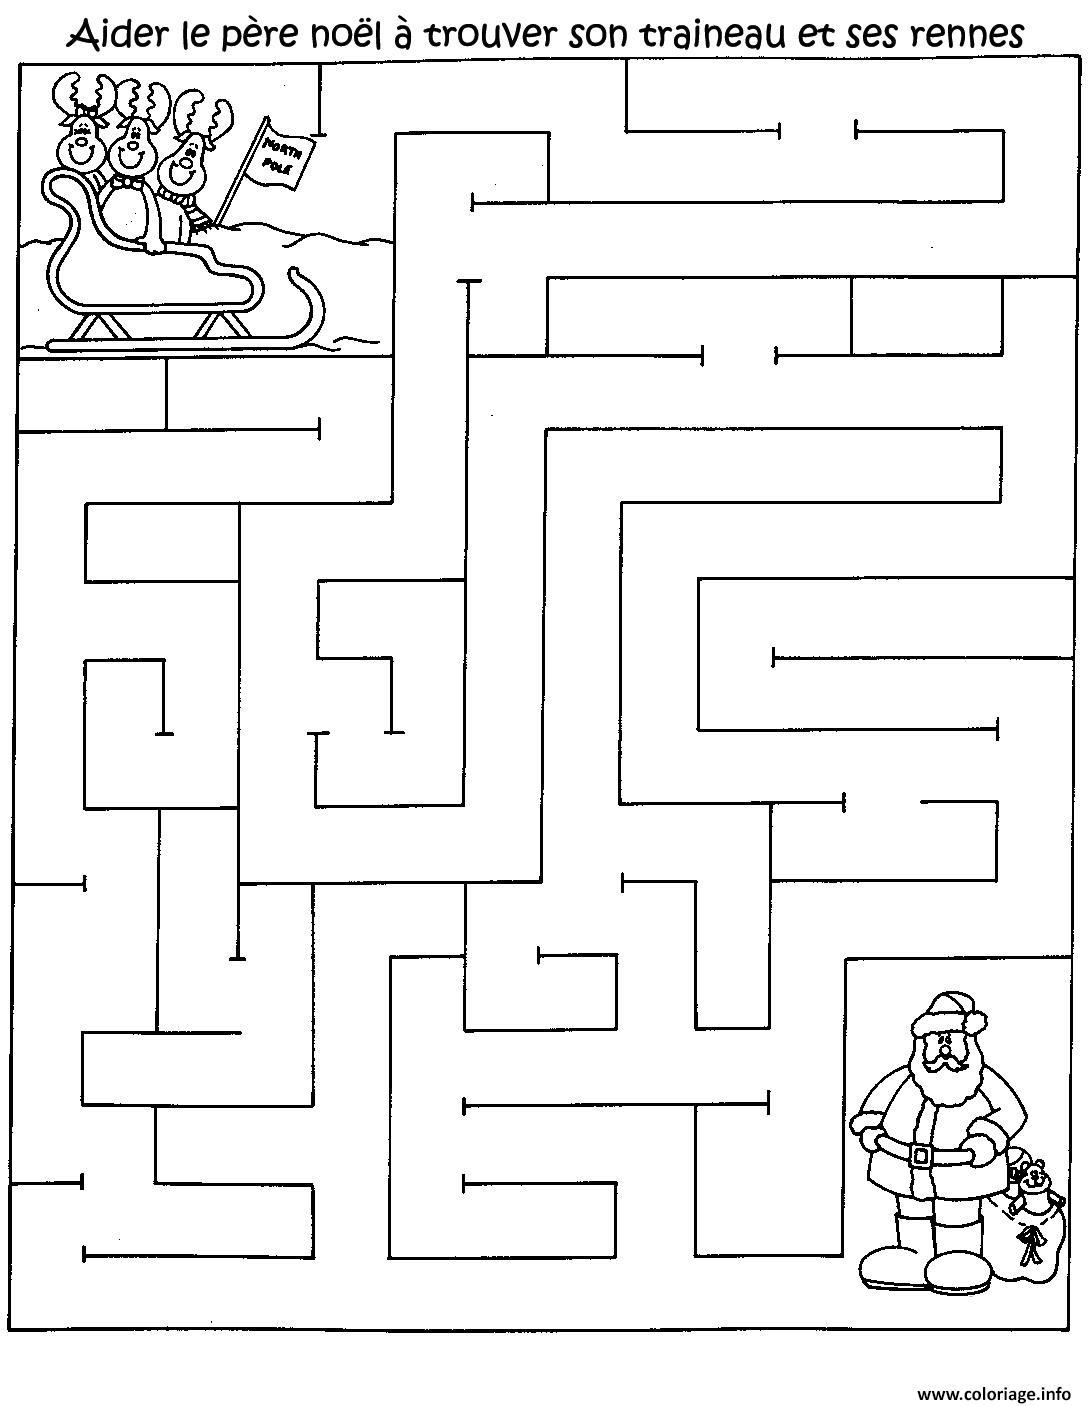 Coloriage Jeu Pere Noel Labyrinthe Noel Gratuit Imprimer Dessin concernant Labyrinthe A Imprimer